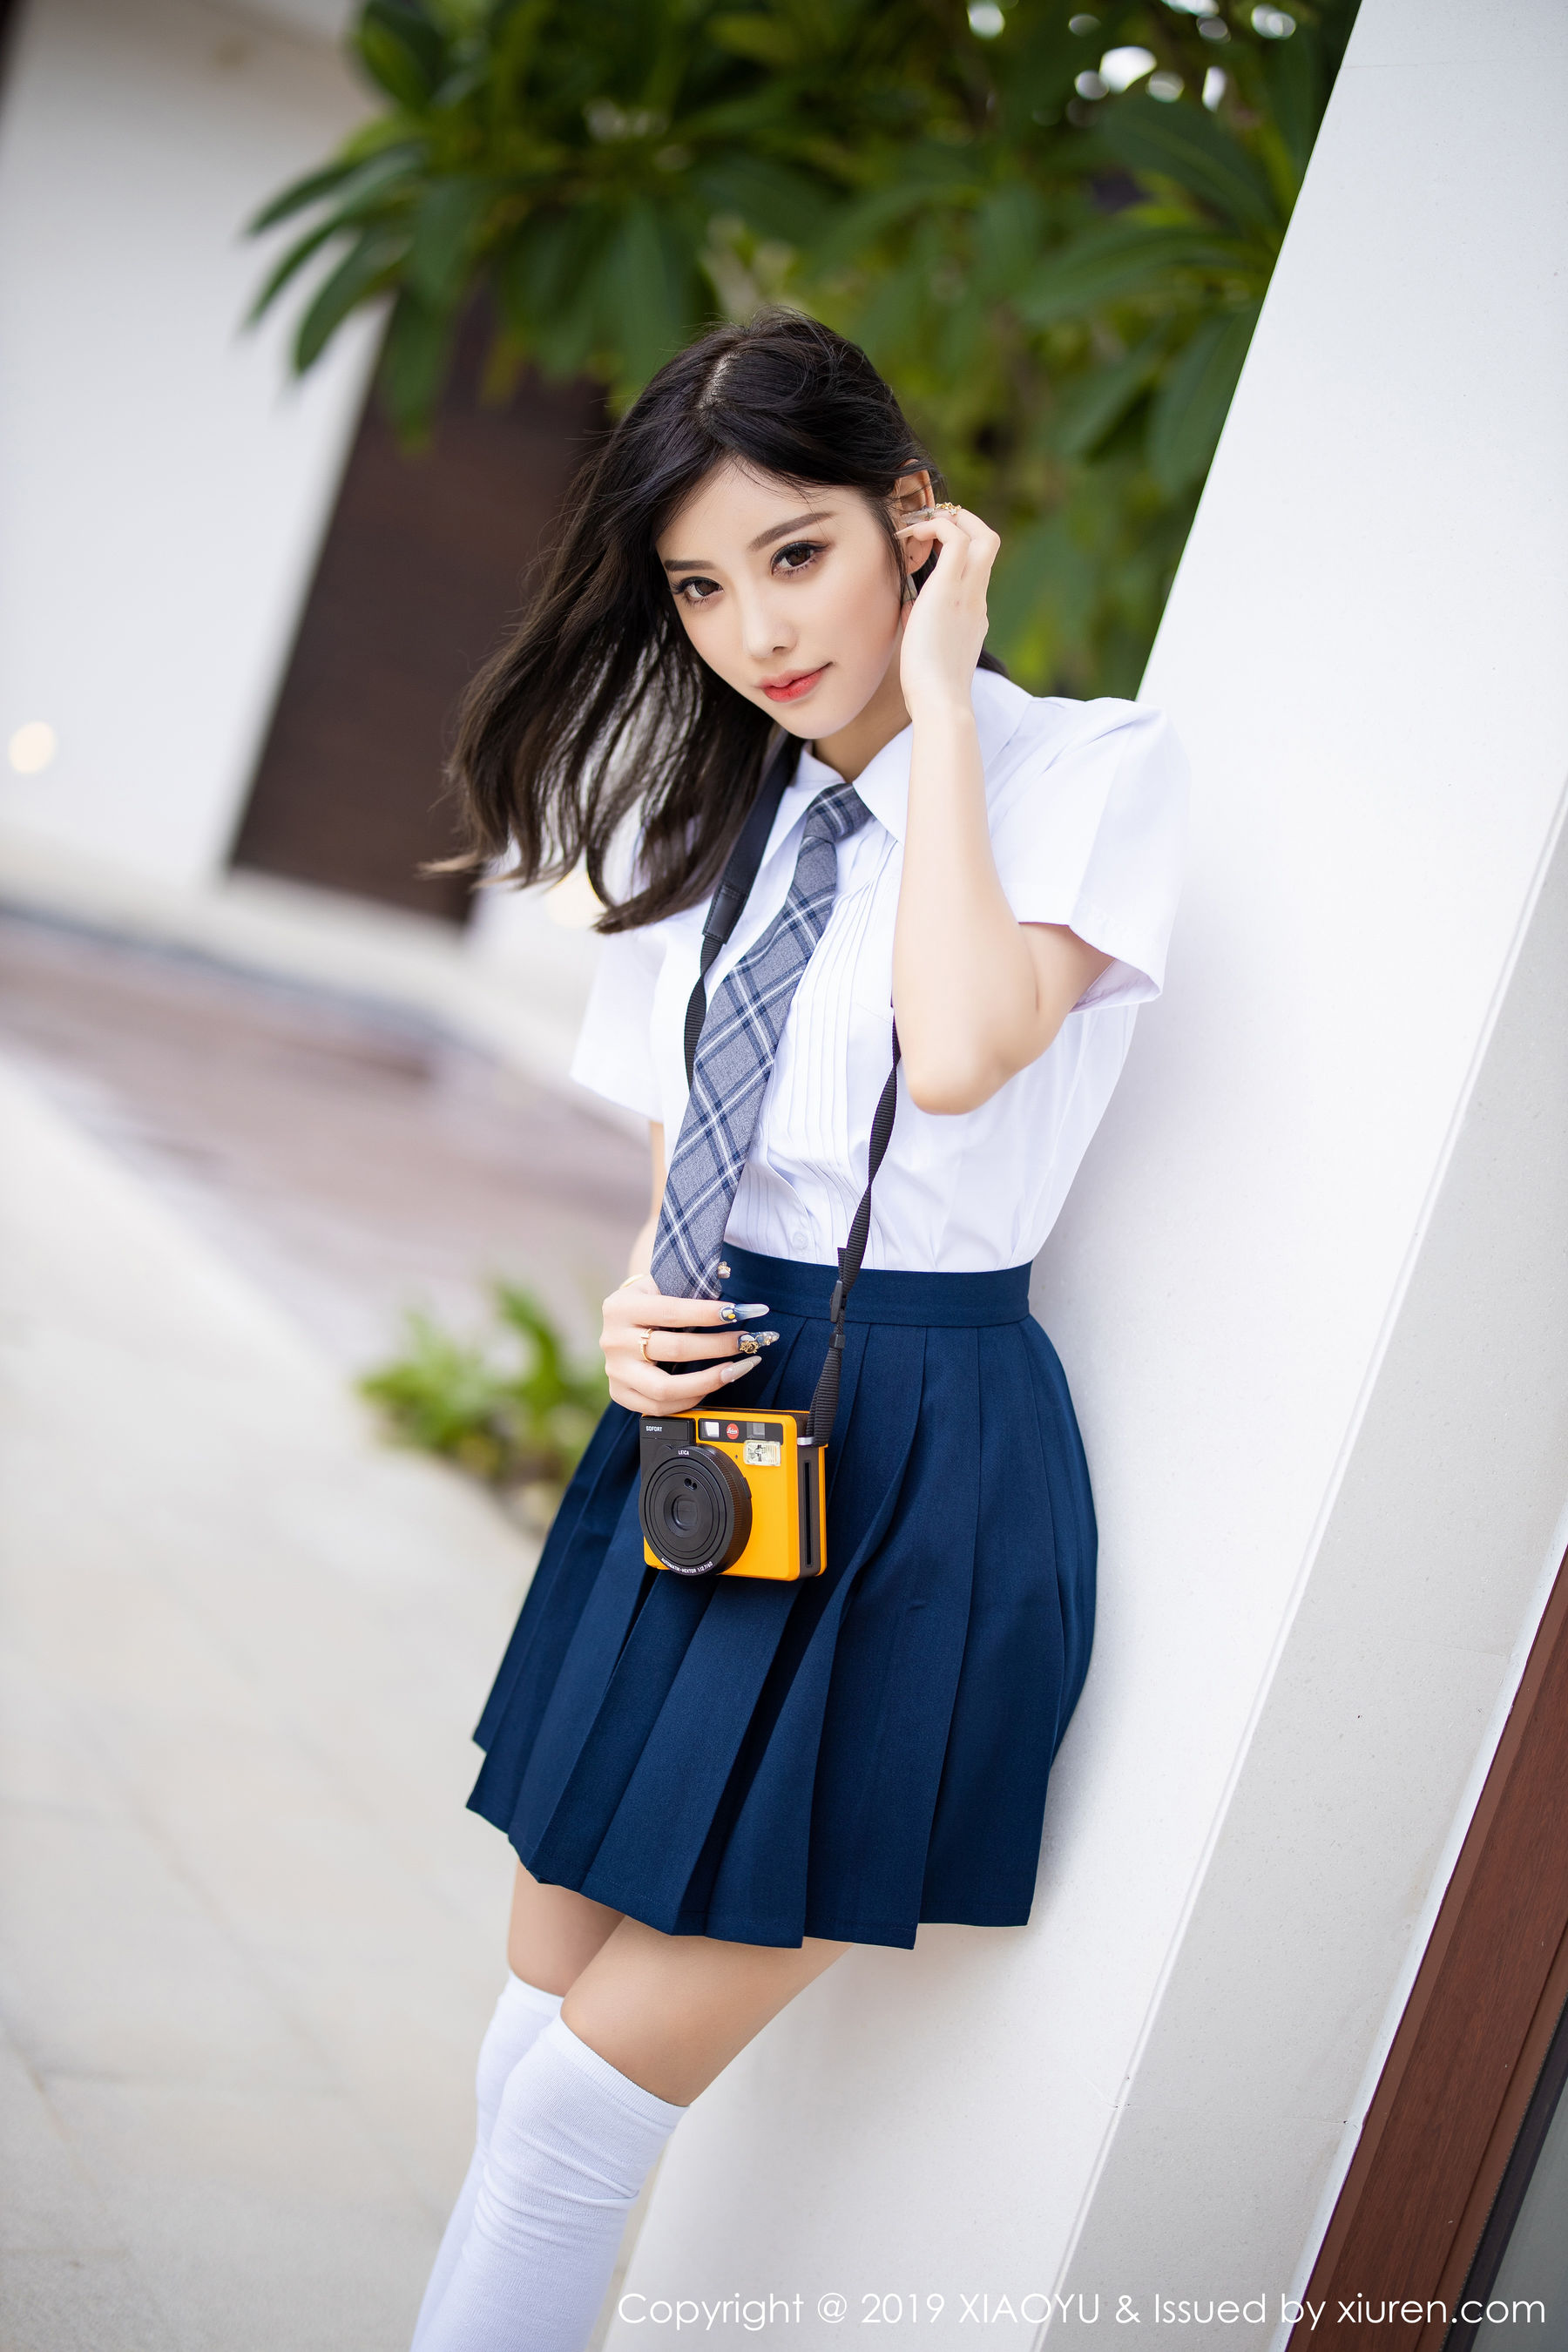 uniformc006